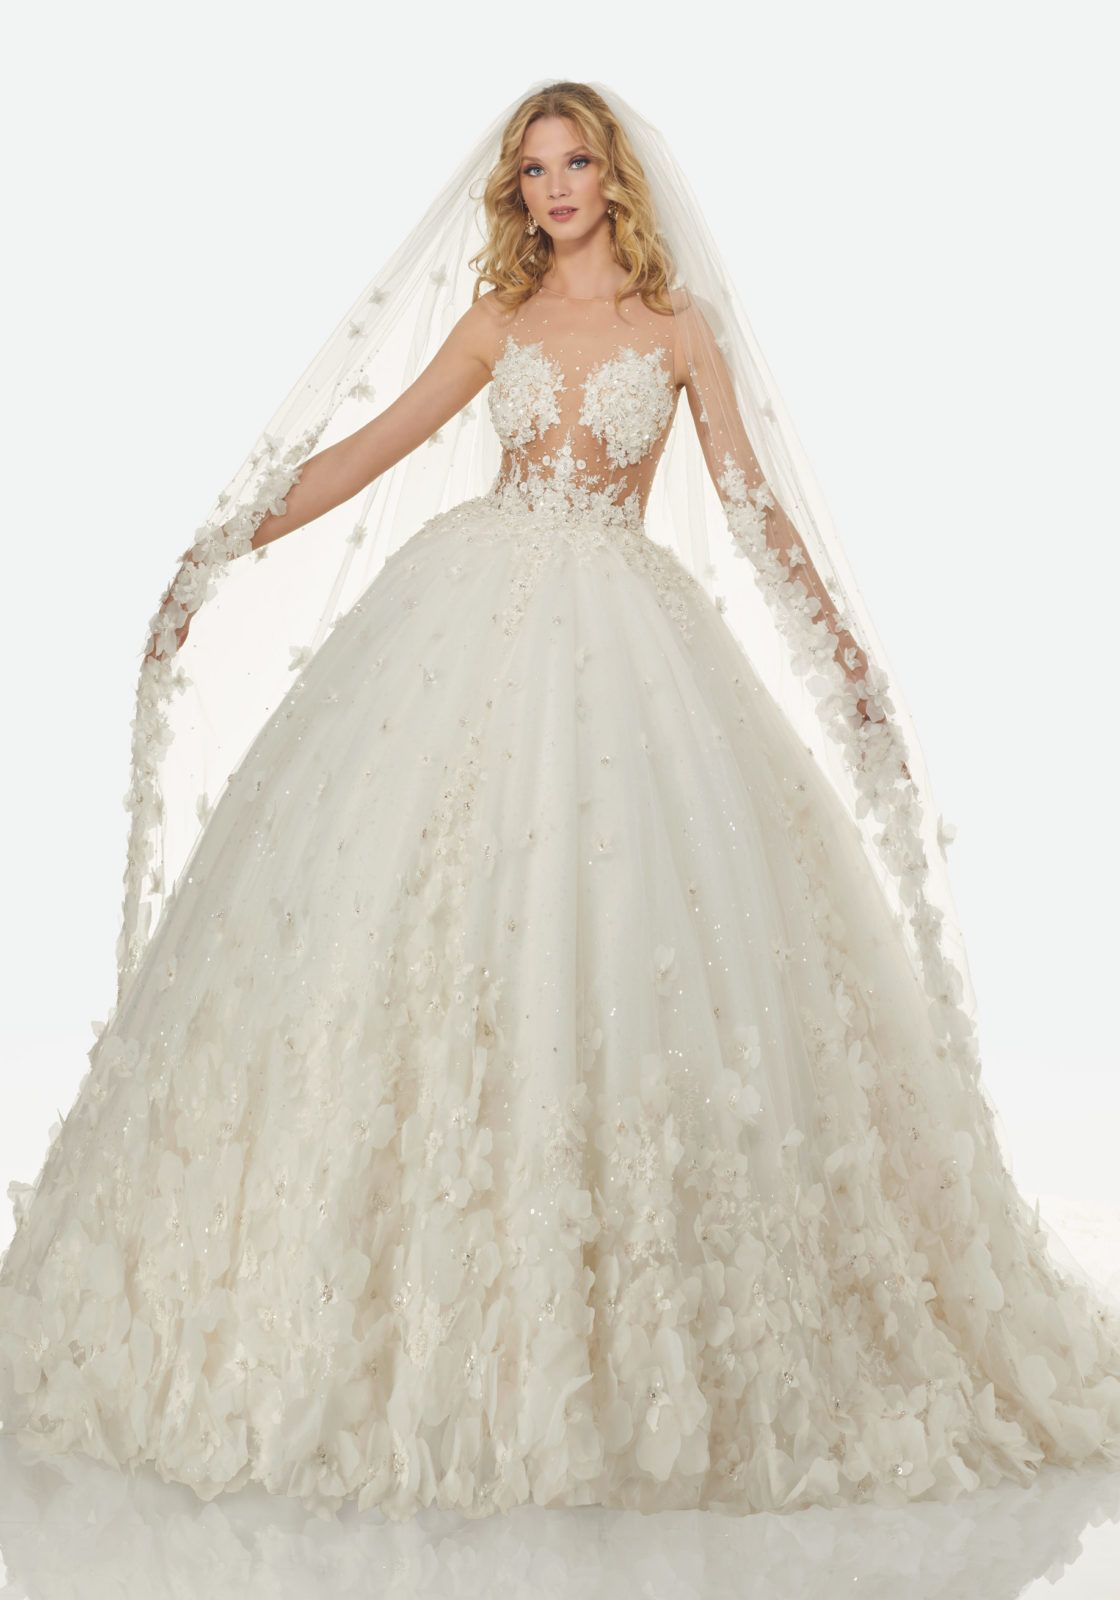 Brandi wedding dress wedding dresses u bridal couture pinterest